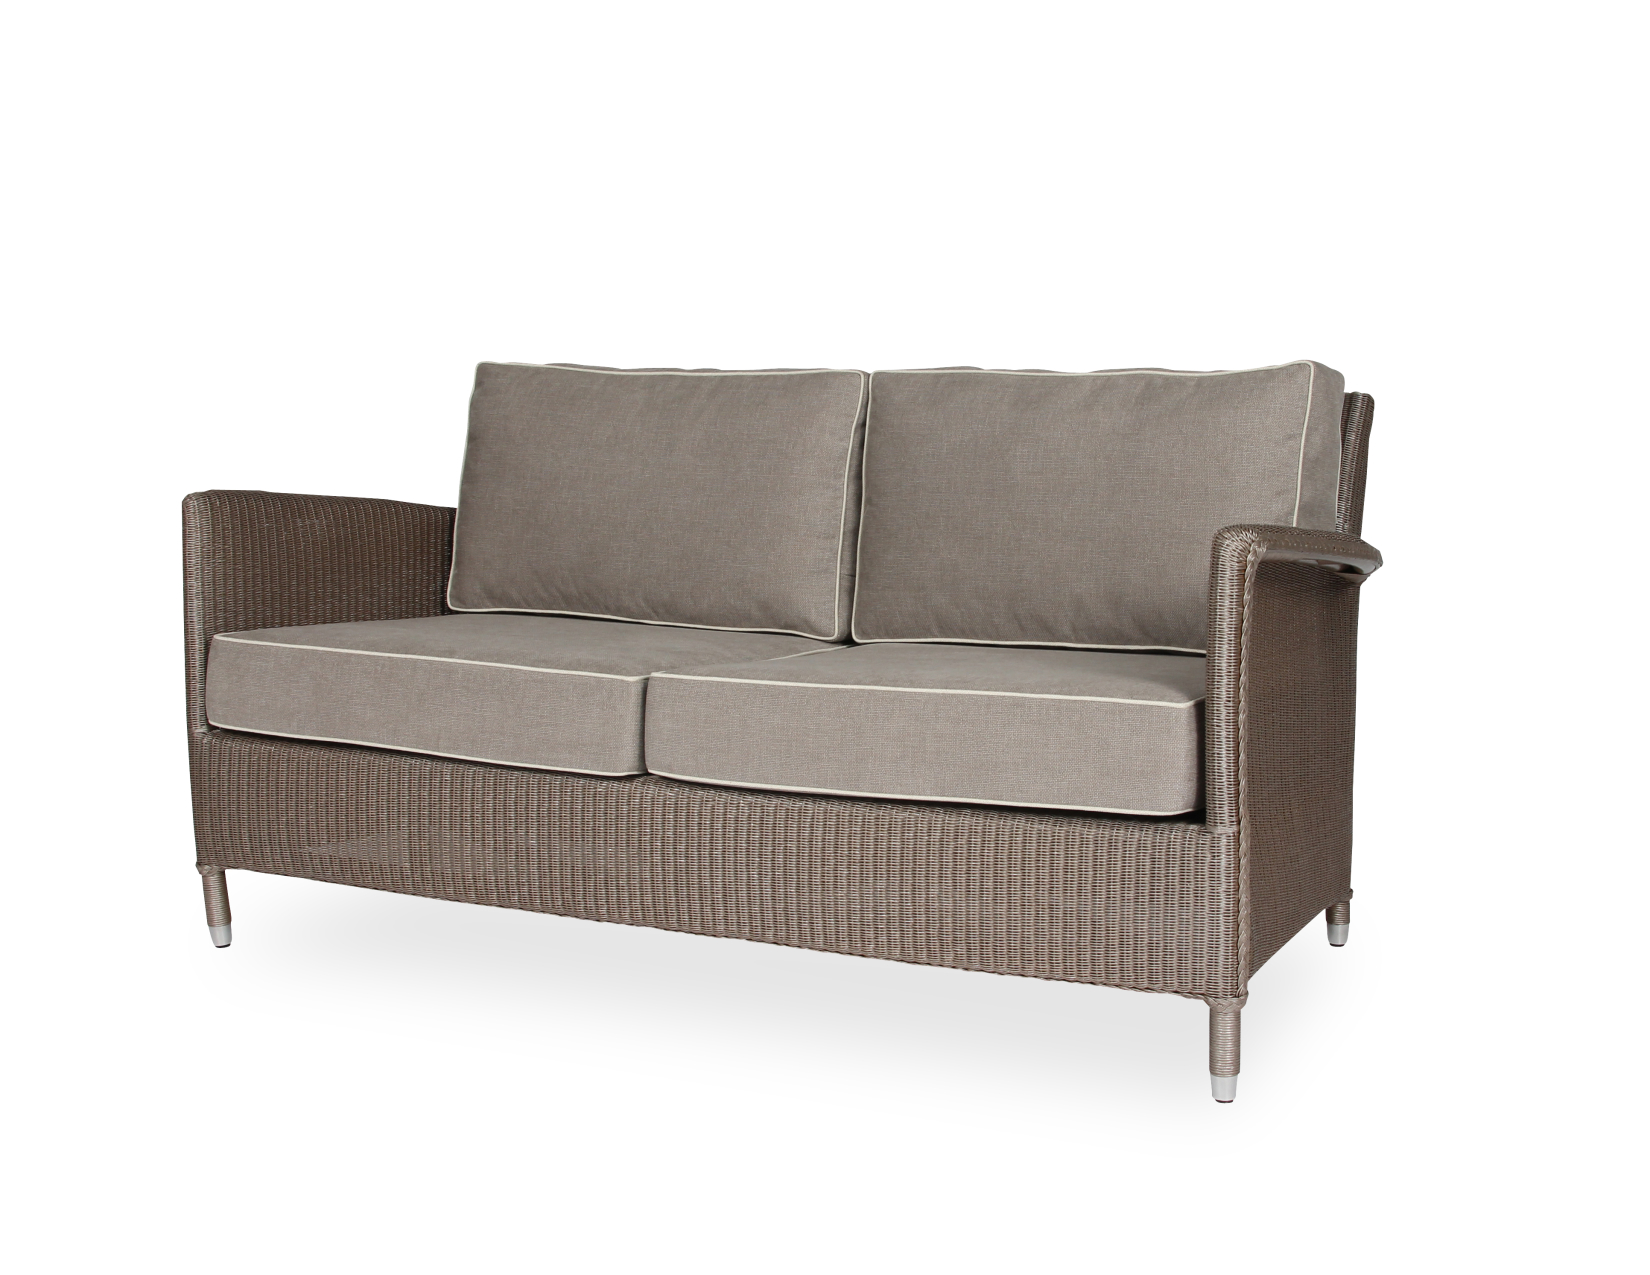 Vincent Sheppard Loom Zweisitzer Sofa Cordoba Bei Villatmo De